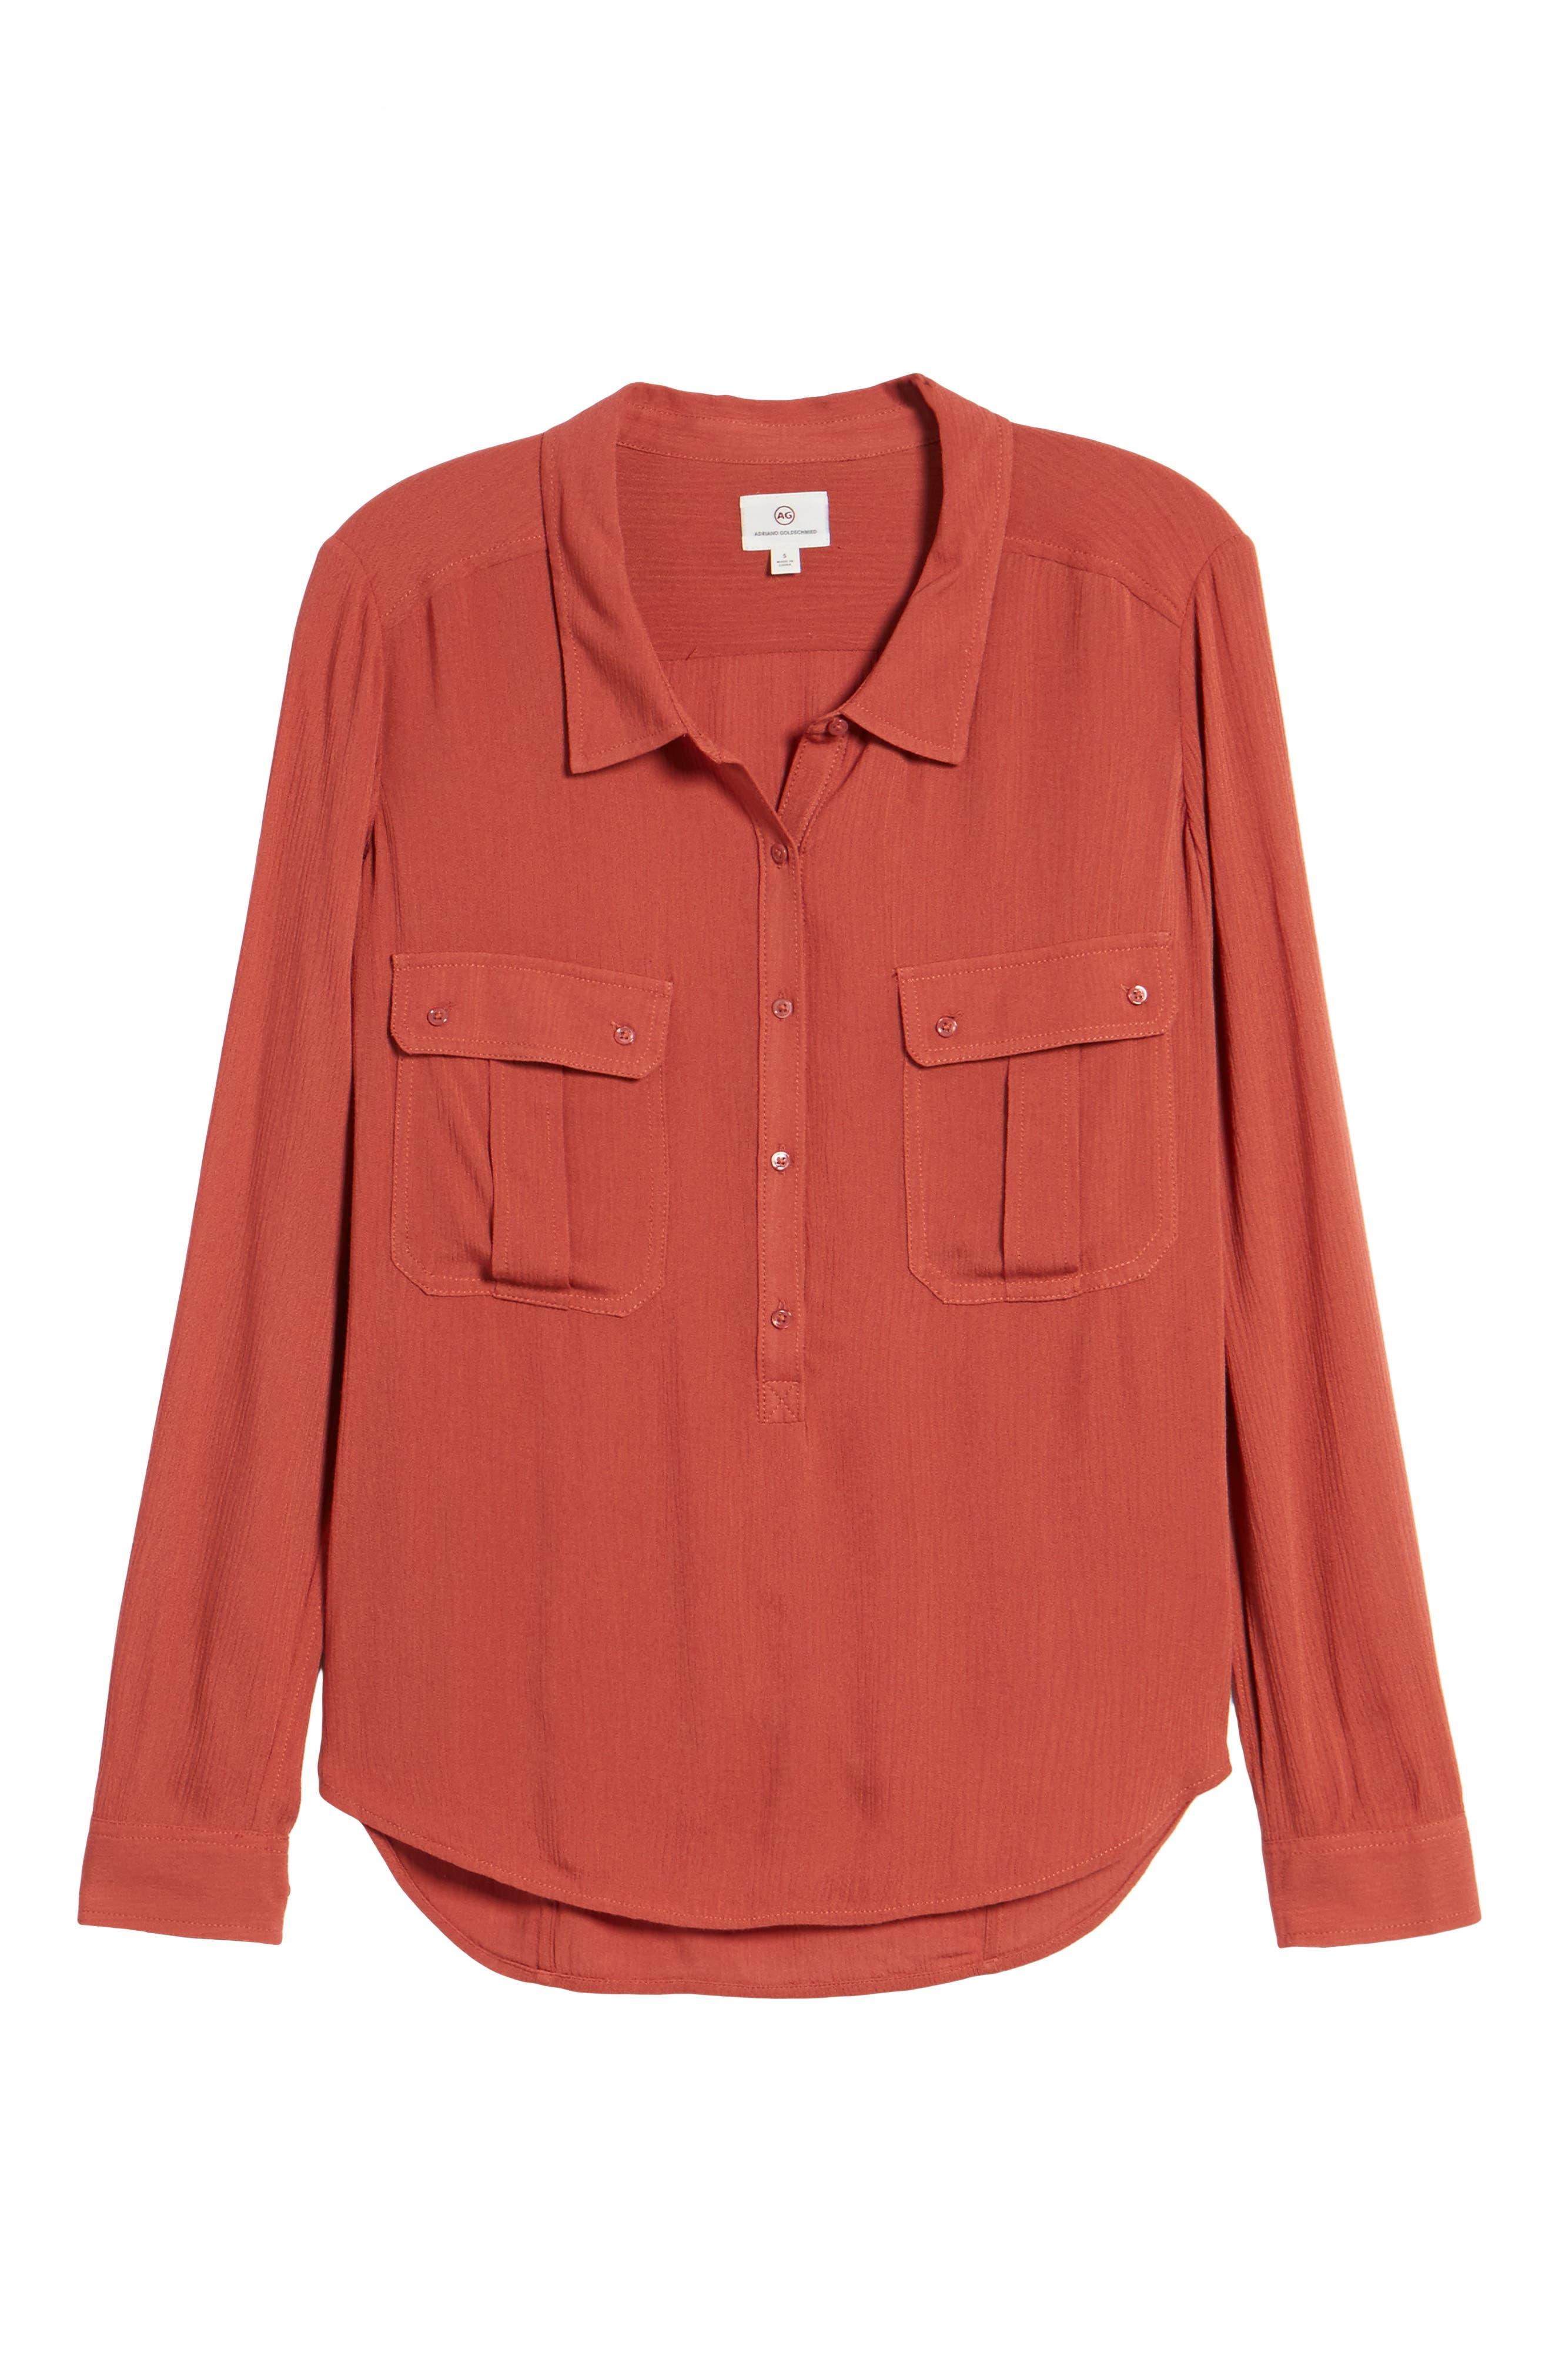 Nevada Cotton Henley Shirt,                             Alternate thumbnail 6, color,                             Firebrick